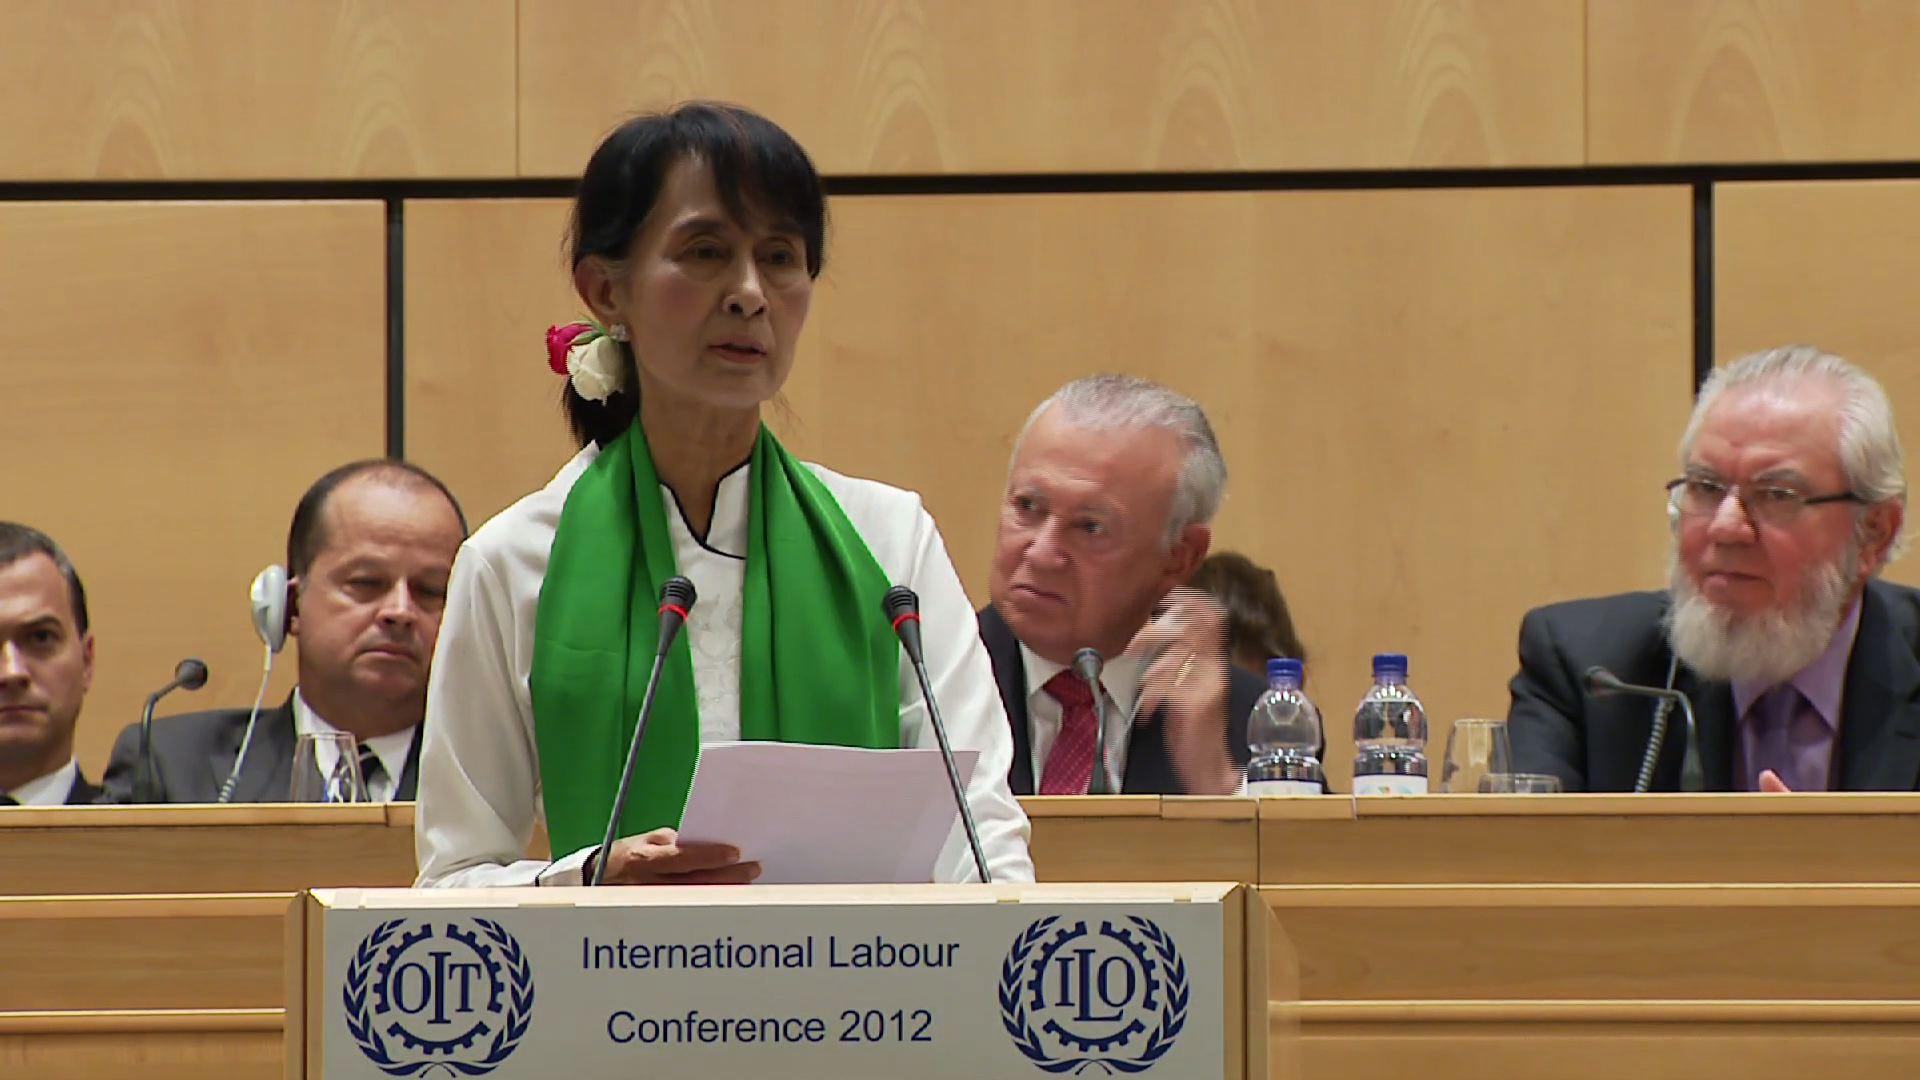 GENEVA  AUNG SAN SUU KYI